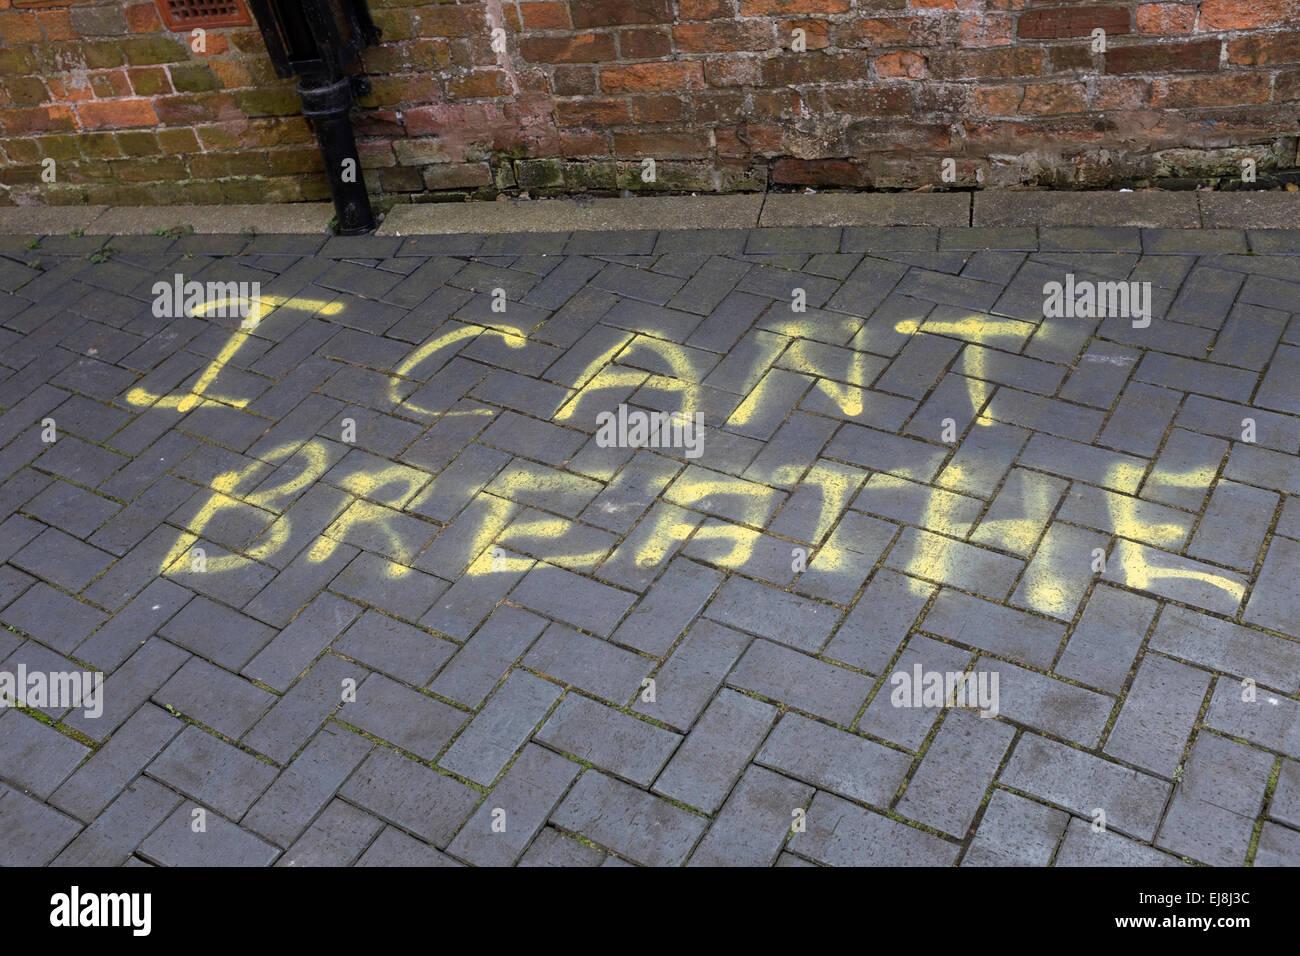 I Can't Breathe Graffiti - Stock Image